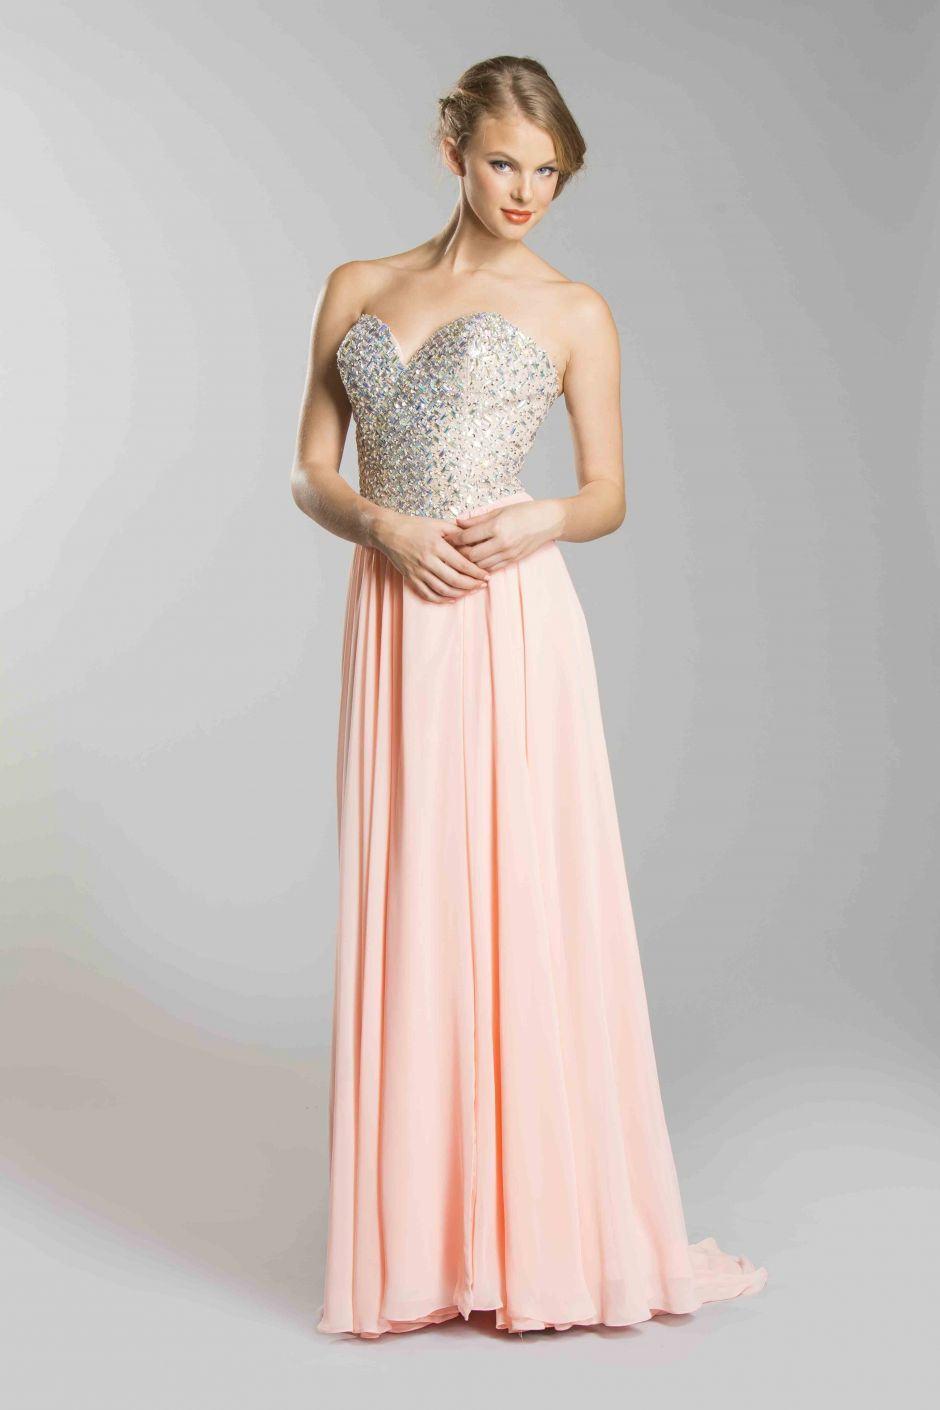 3c1635efb46b Formella Aftonklänningar - Darius Cordell Fashion Ltd